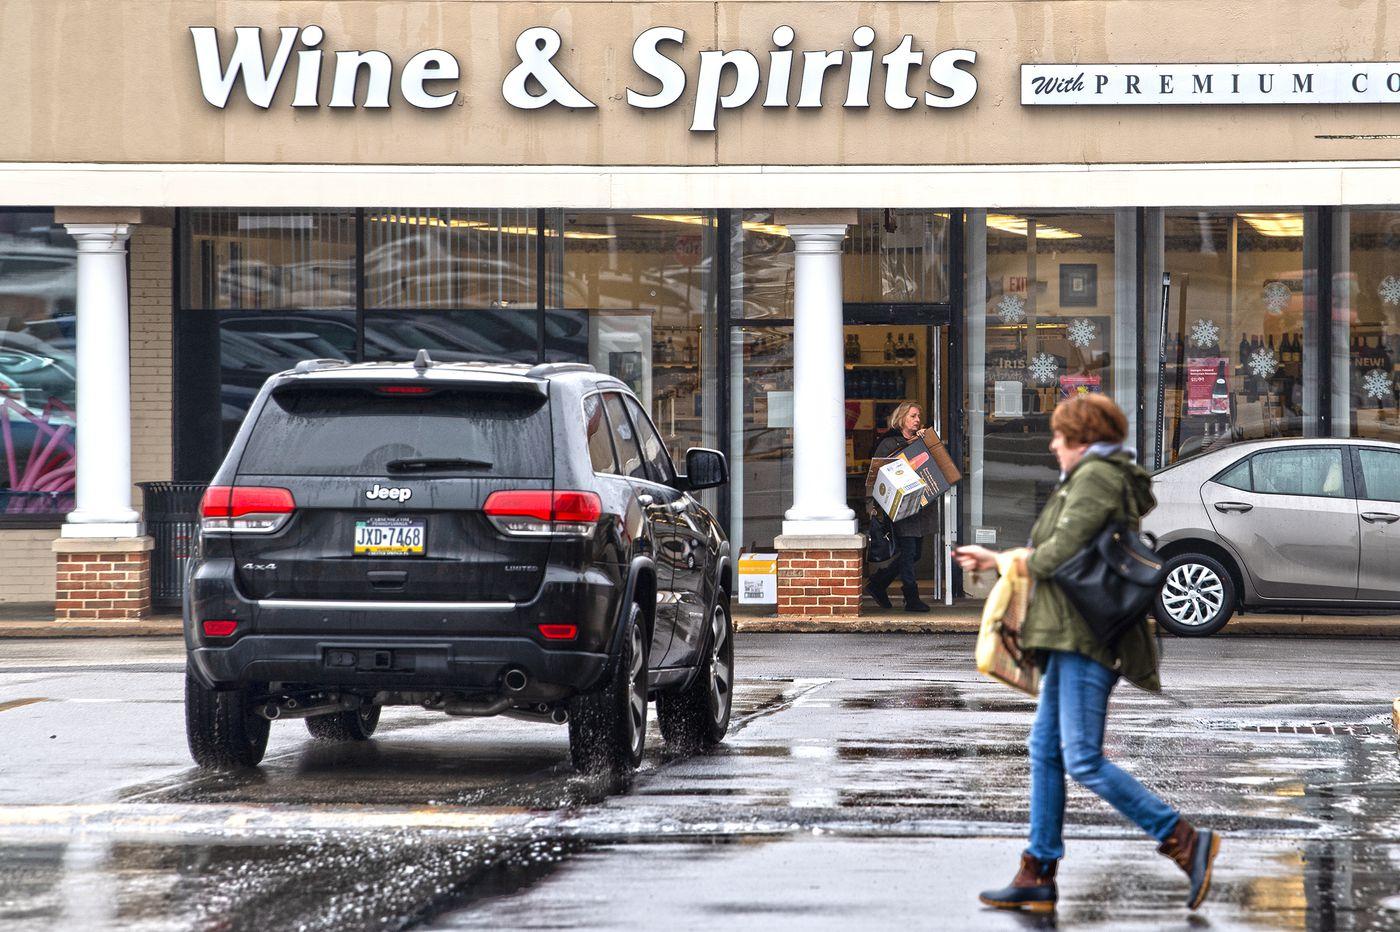 Coronavirus Shutdown Of Pennsylvania Wine And Liquor Stores In Philadelphia Suburbs Is Tuesday Last Day For 2 Weeks